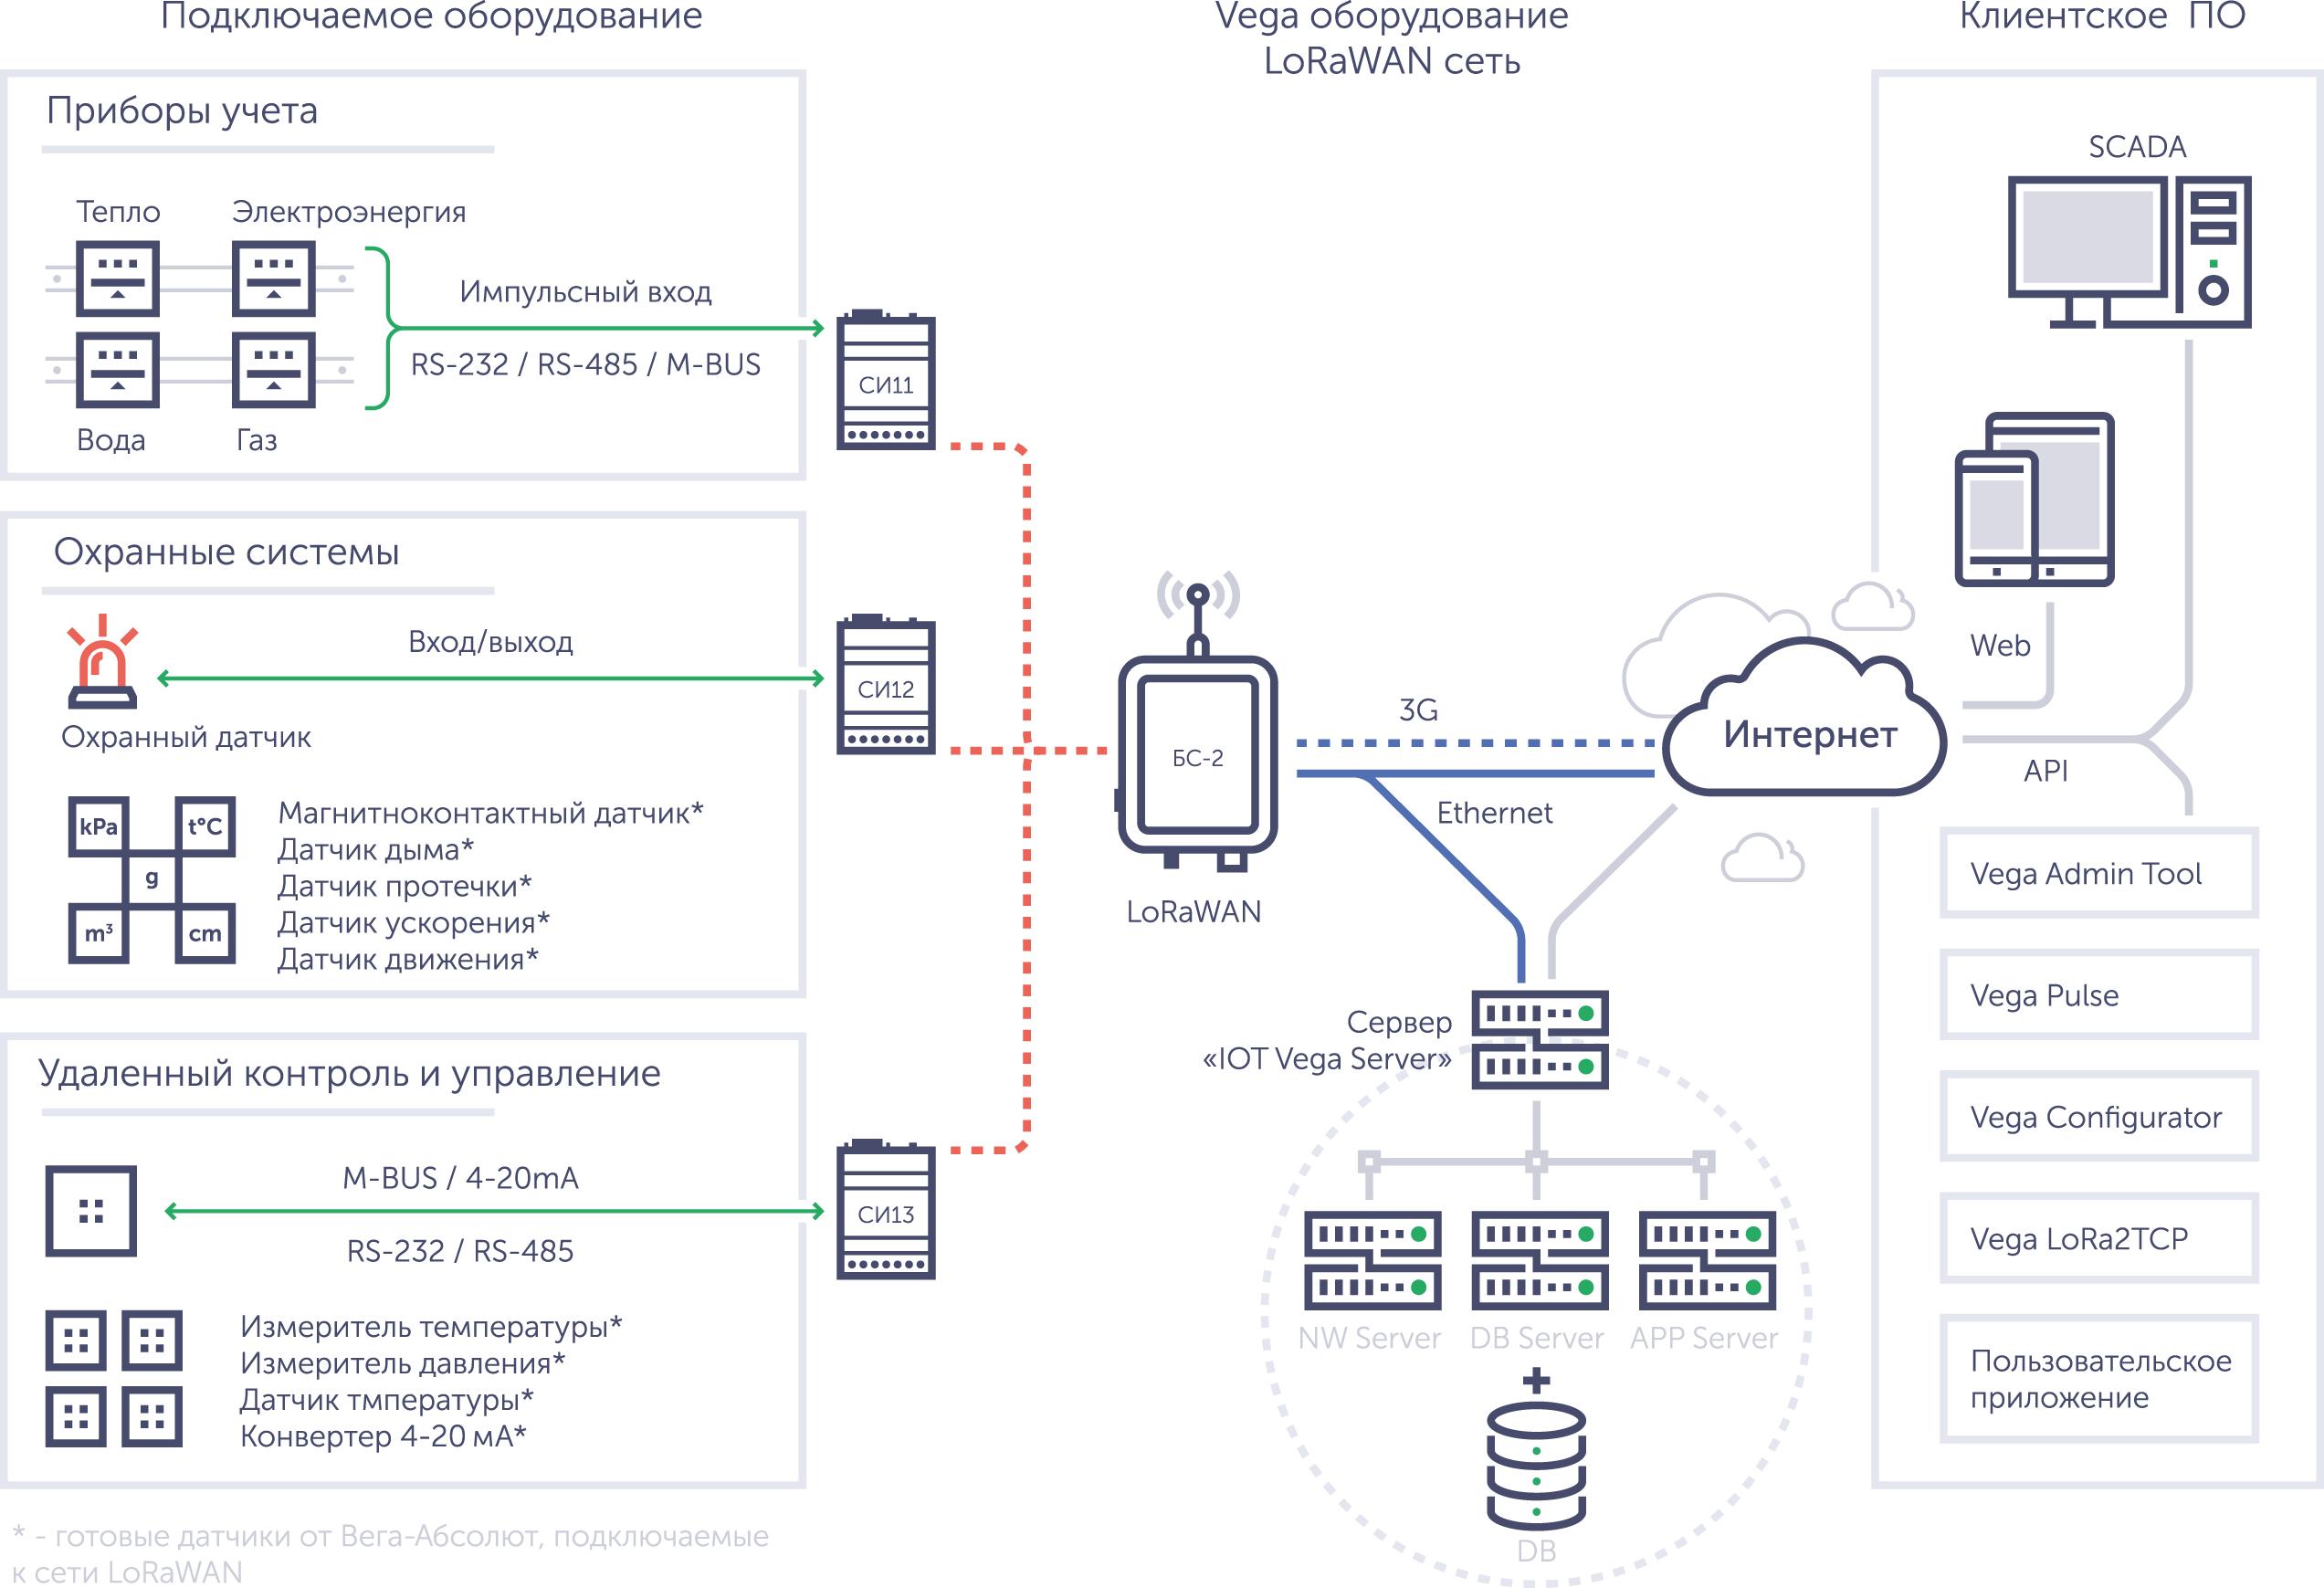 Общая схема LoRaWAN-сети